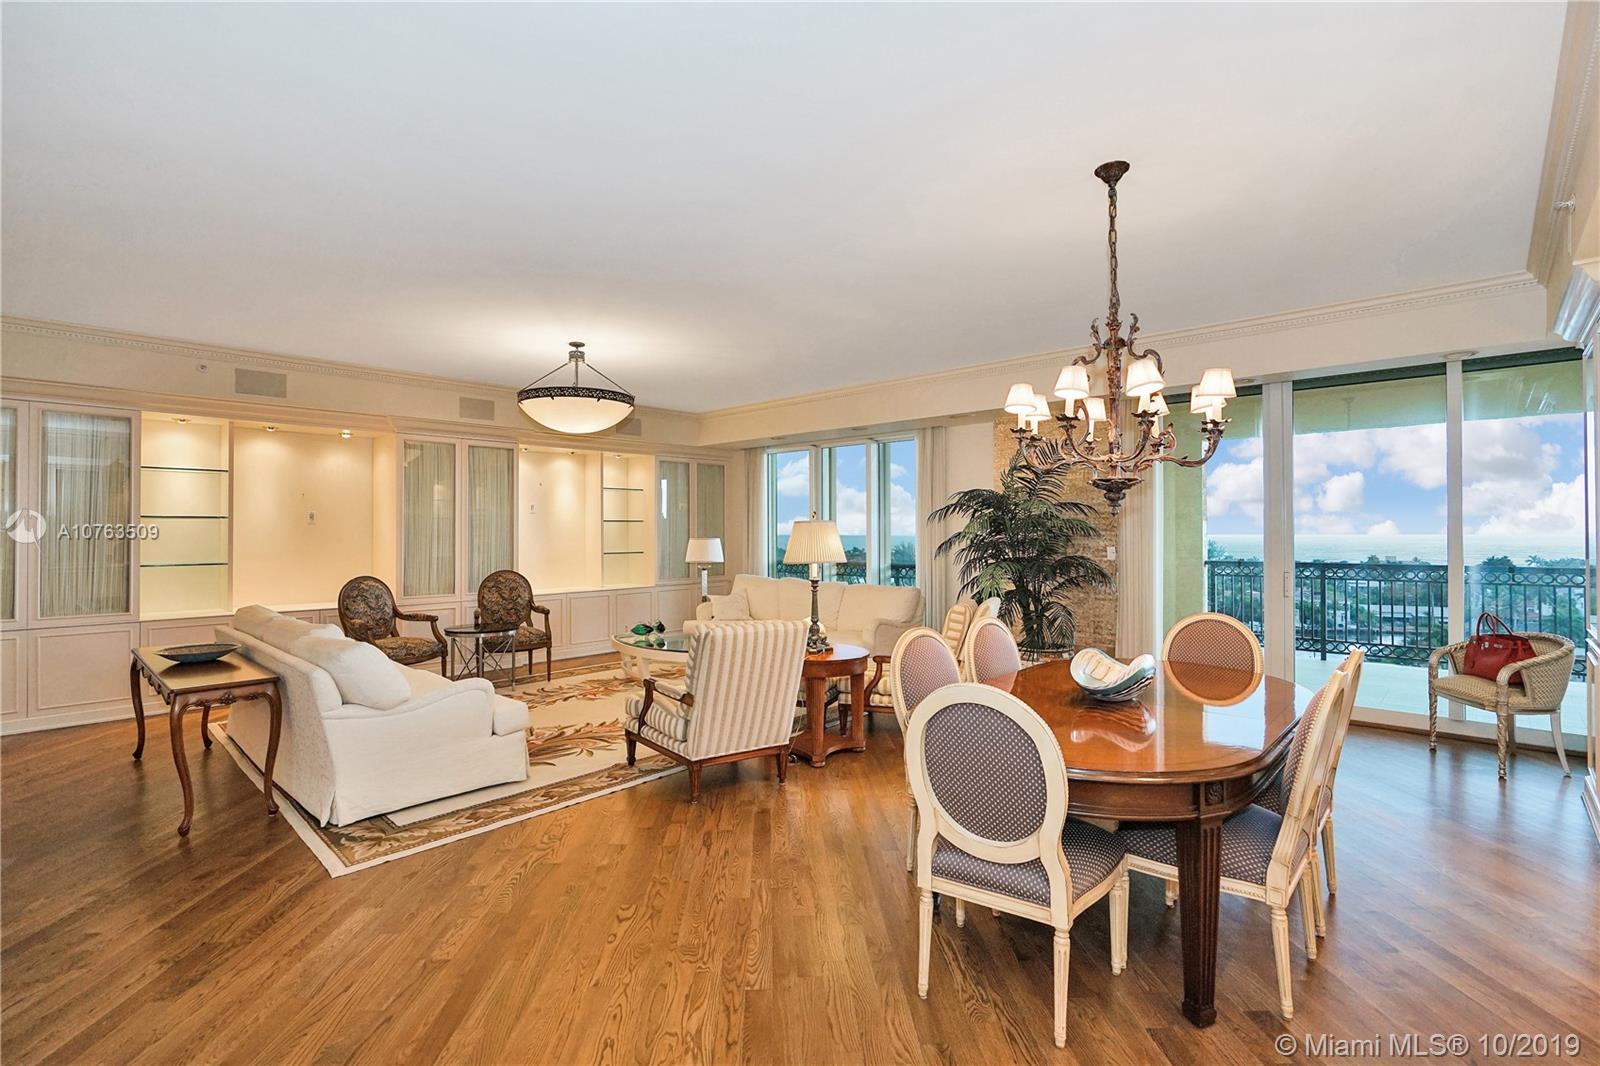 20165 NE 39th Pl #1002, Aventura, FL 33180 - Aventura, FL real estate listing